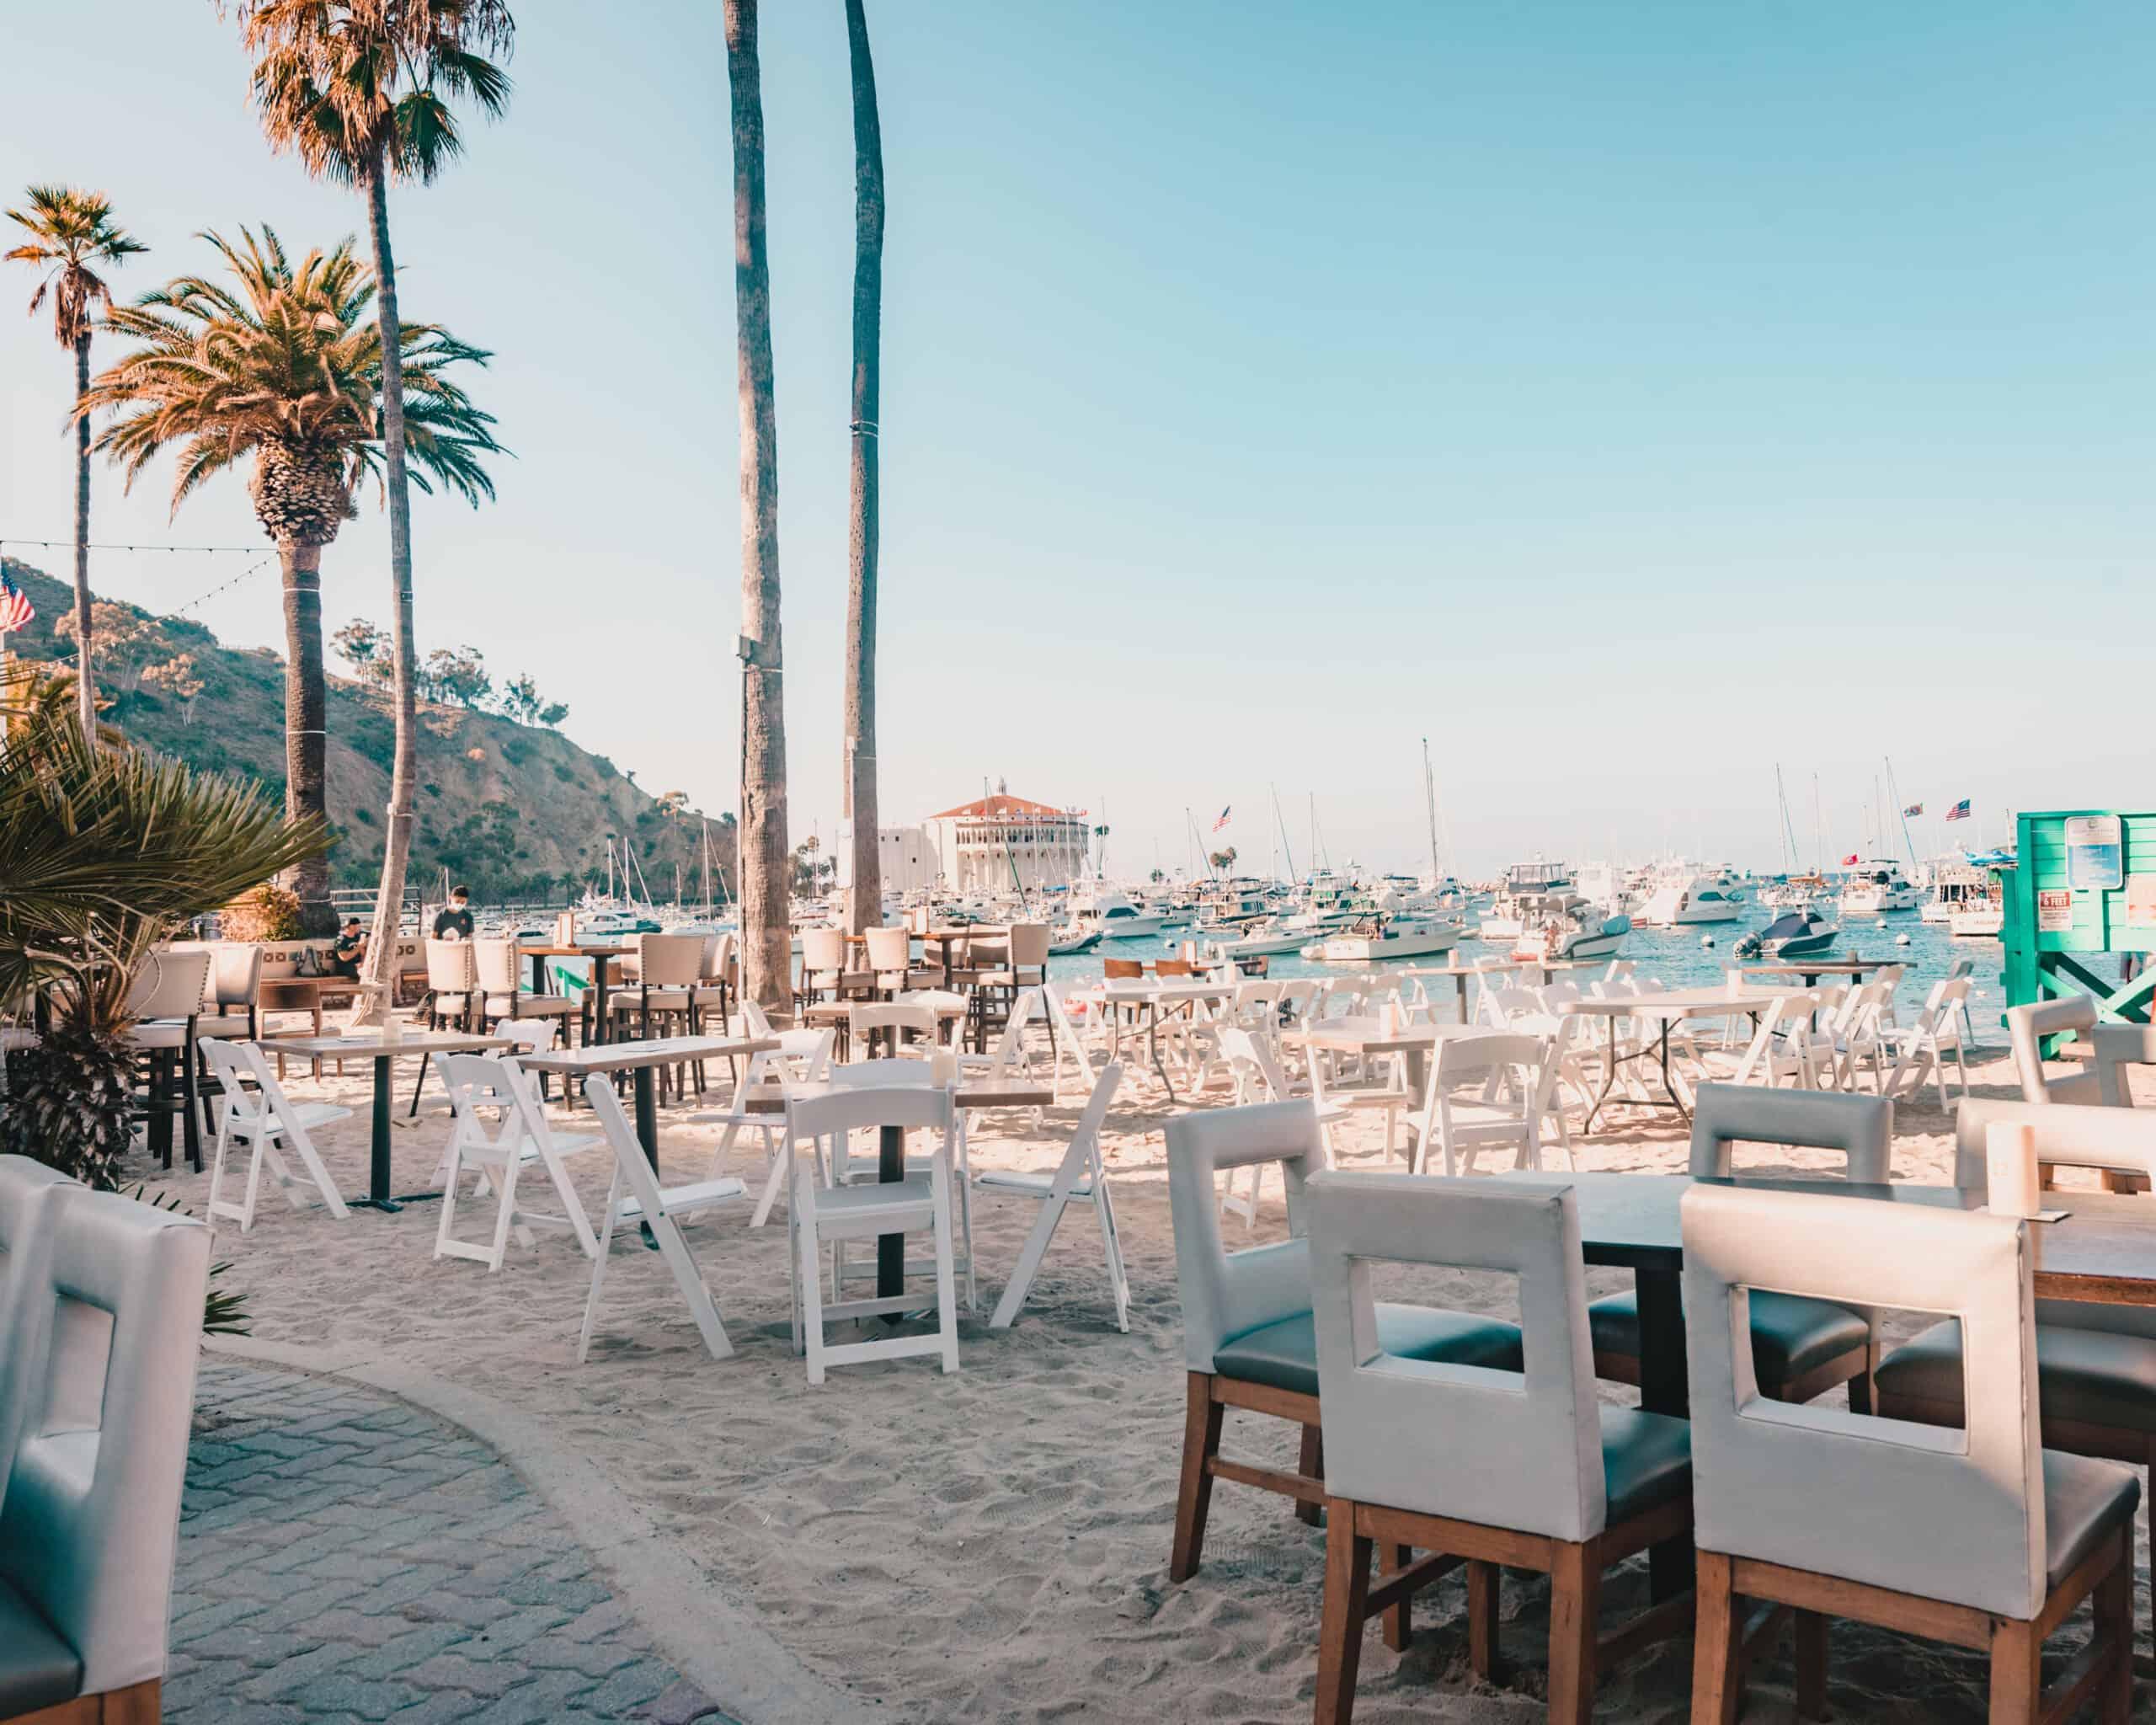 Outdoor Dining Santa Catalina Island, California